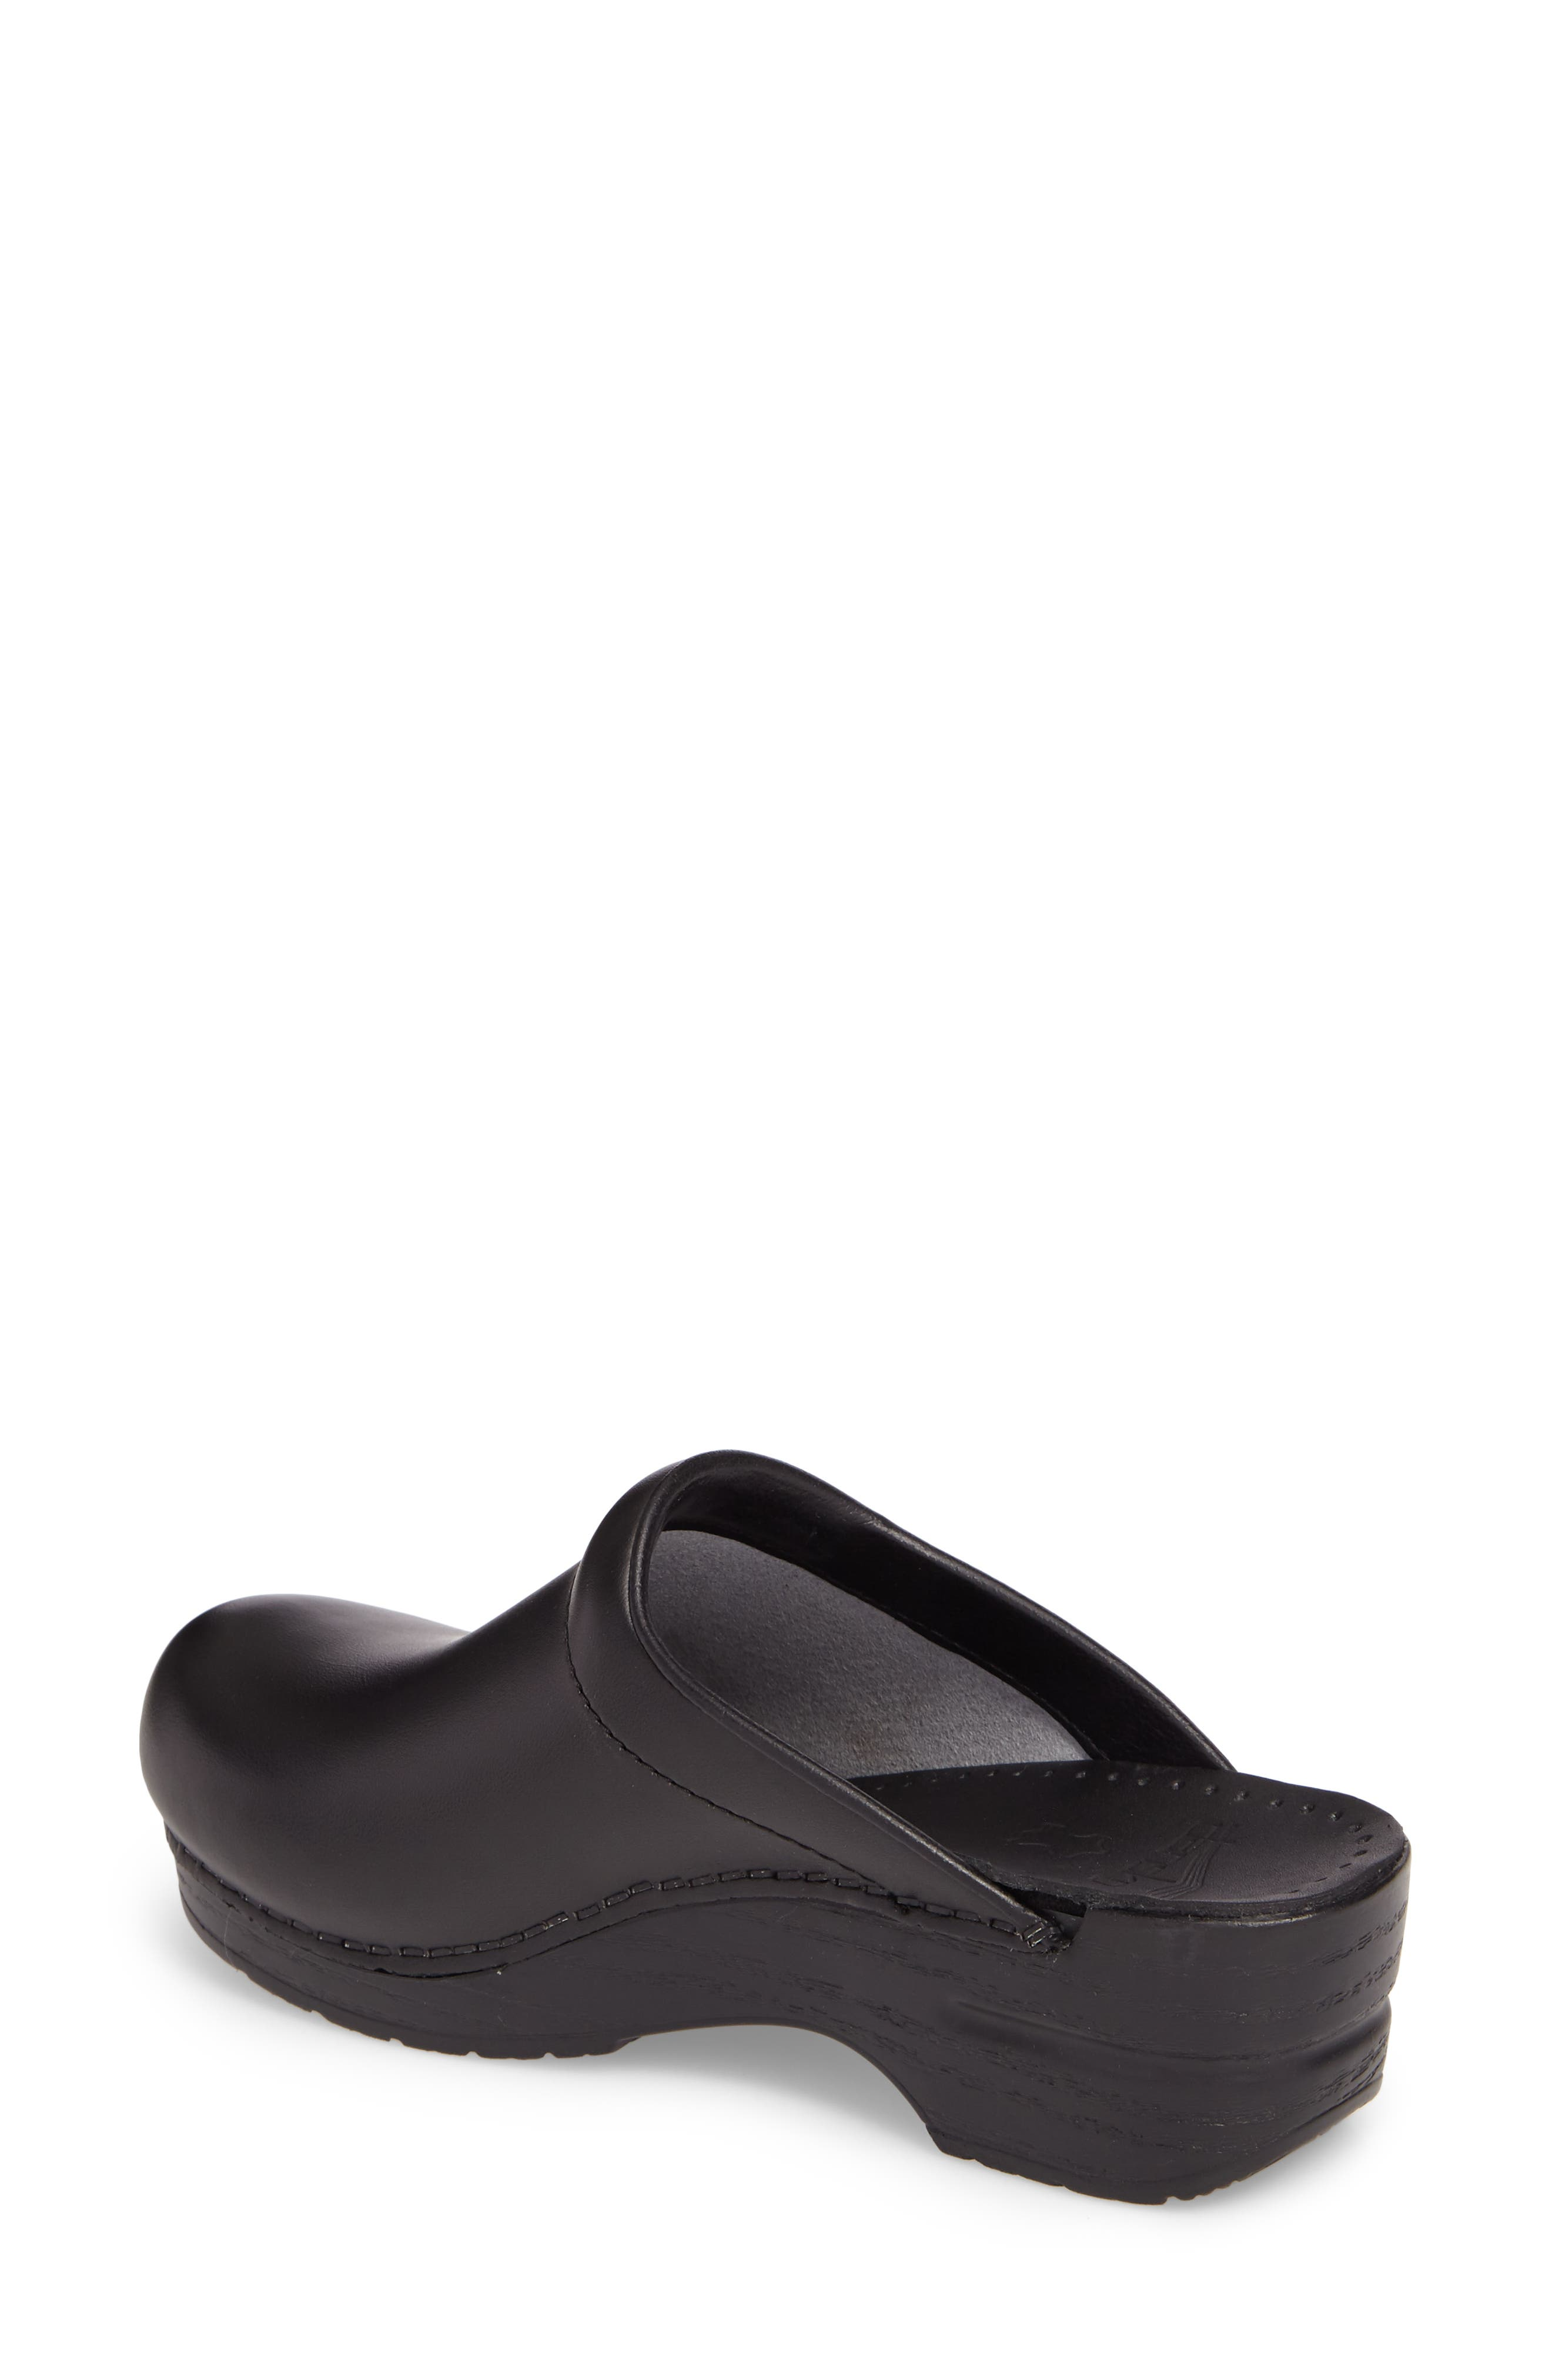 'Sonja' Patent Leather Clog,                             Alternate thumbnail 2, color,                             BLACK BOX LEATHER